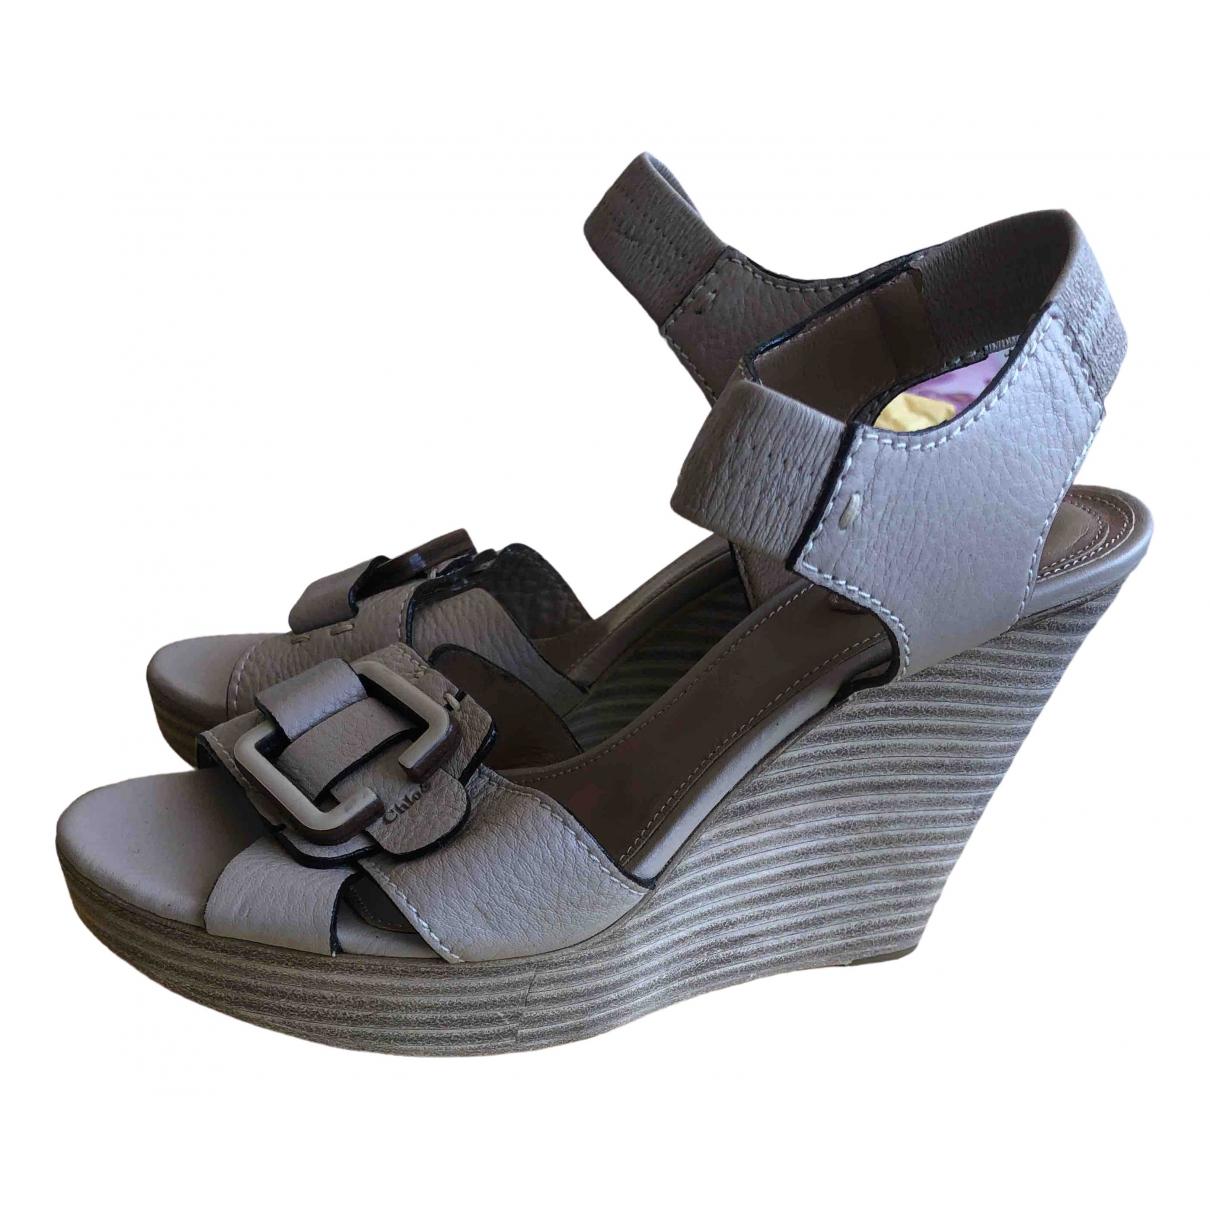 Chloé \N Beige Leather Sandals for Women 39 EU